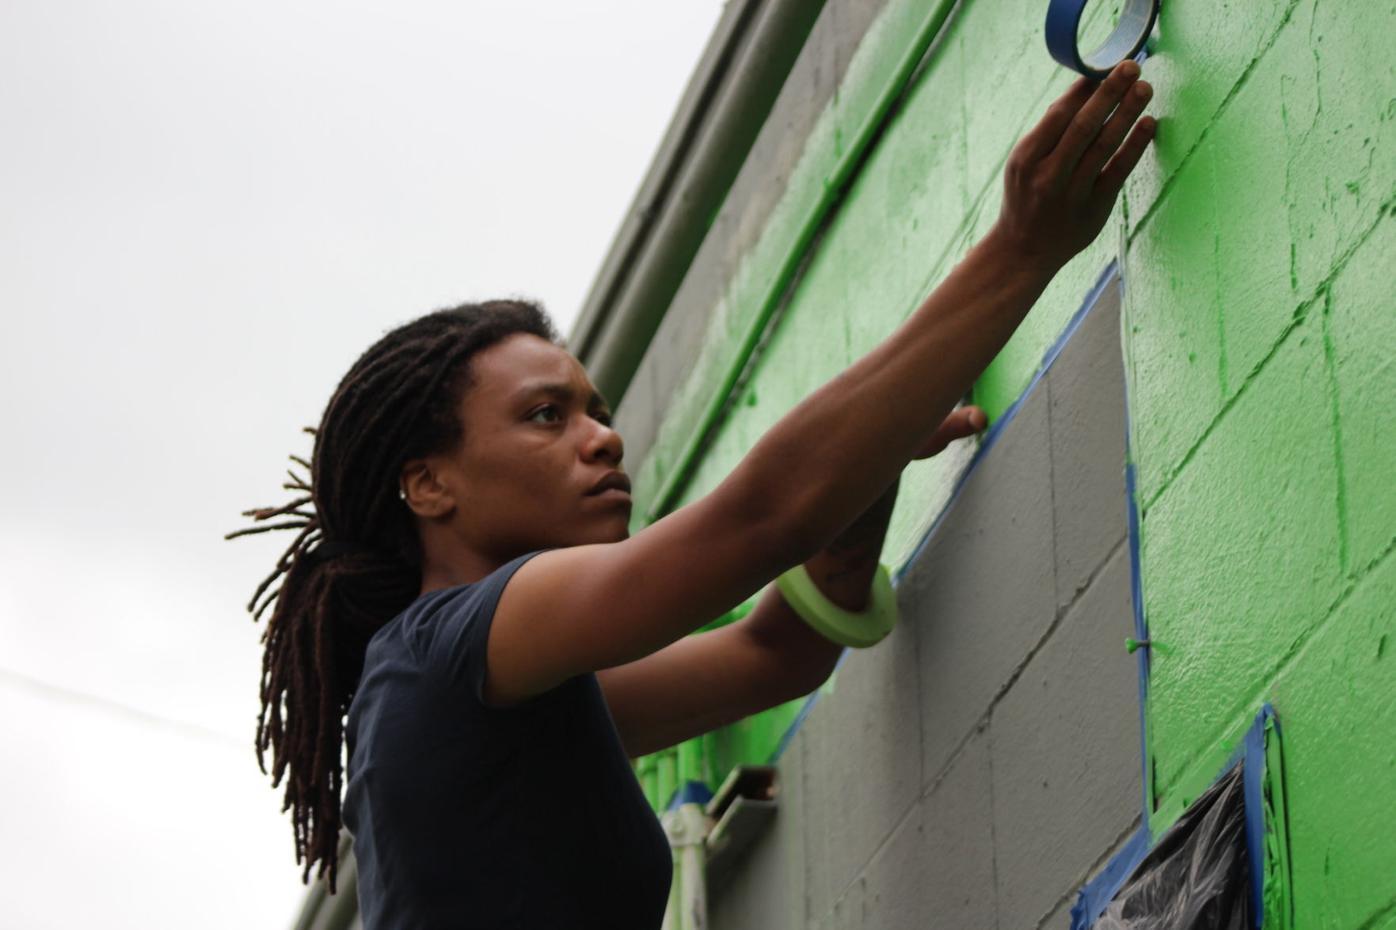 Artist Bobbie Jo-Elle Ennels tapes out mural